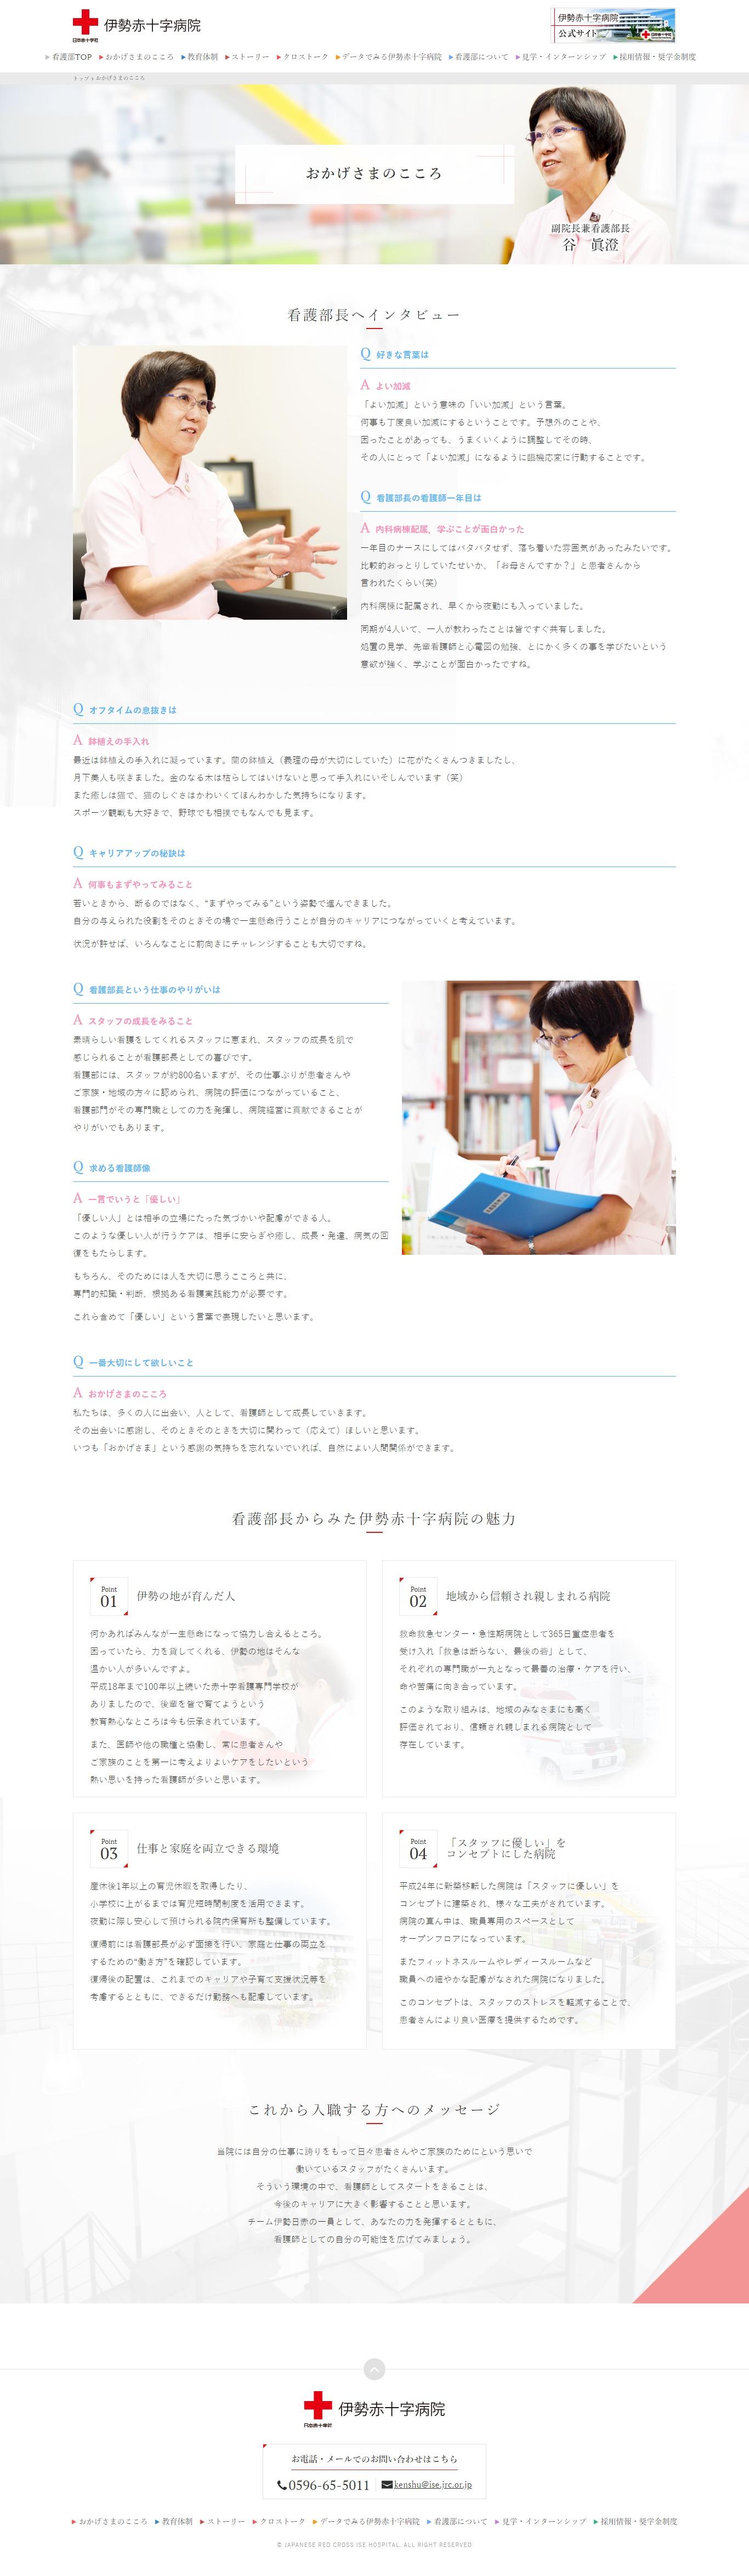 2019年2月作成「伊勢赤十字病院」看護部サイト_サブ画像